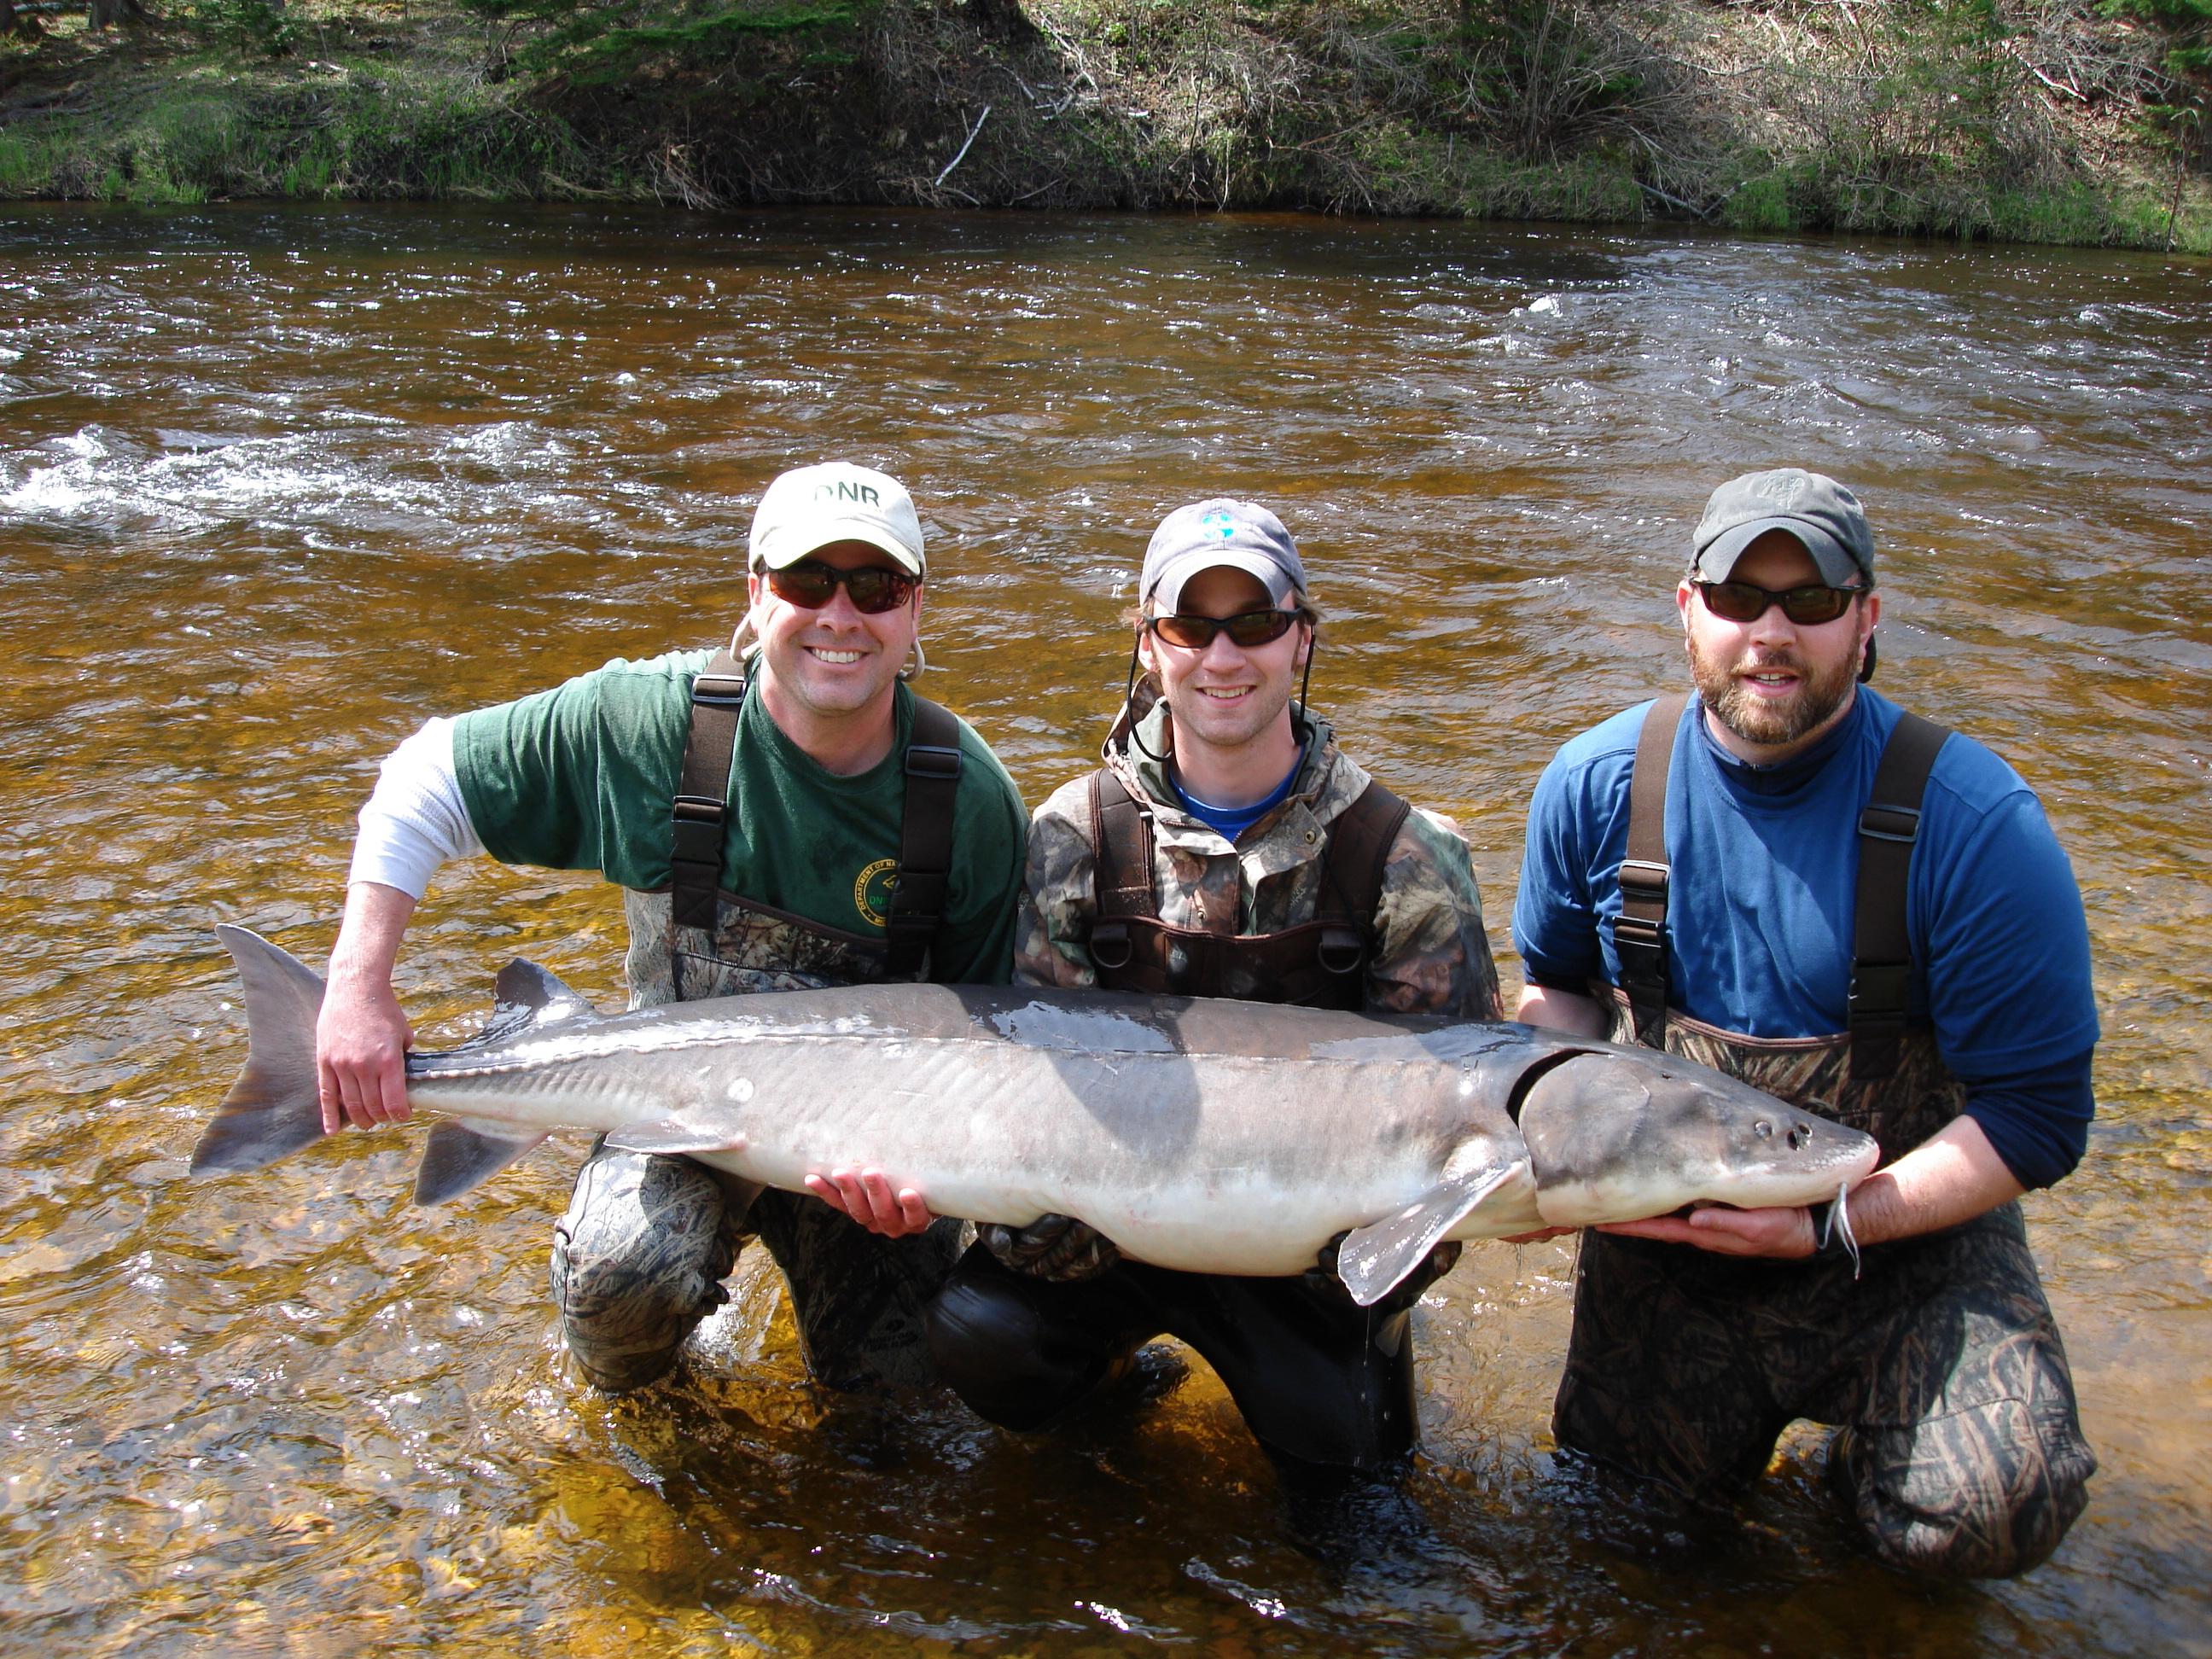 Sturgeon season to open on michigan lake michigan radio for Lake michigan fishing